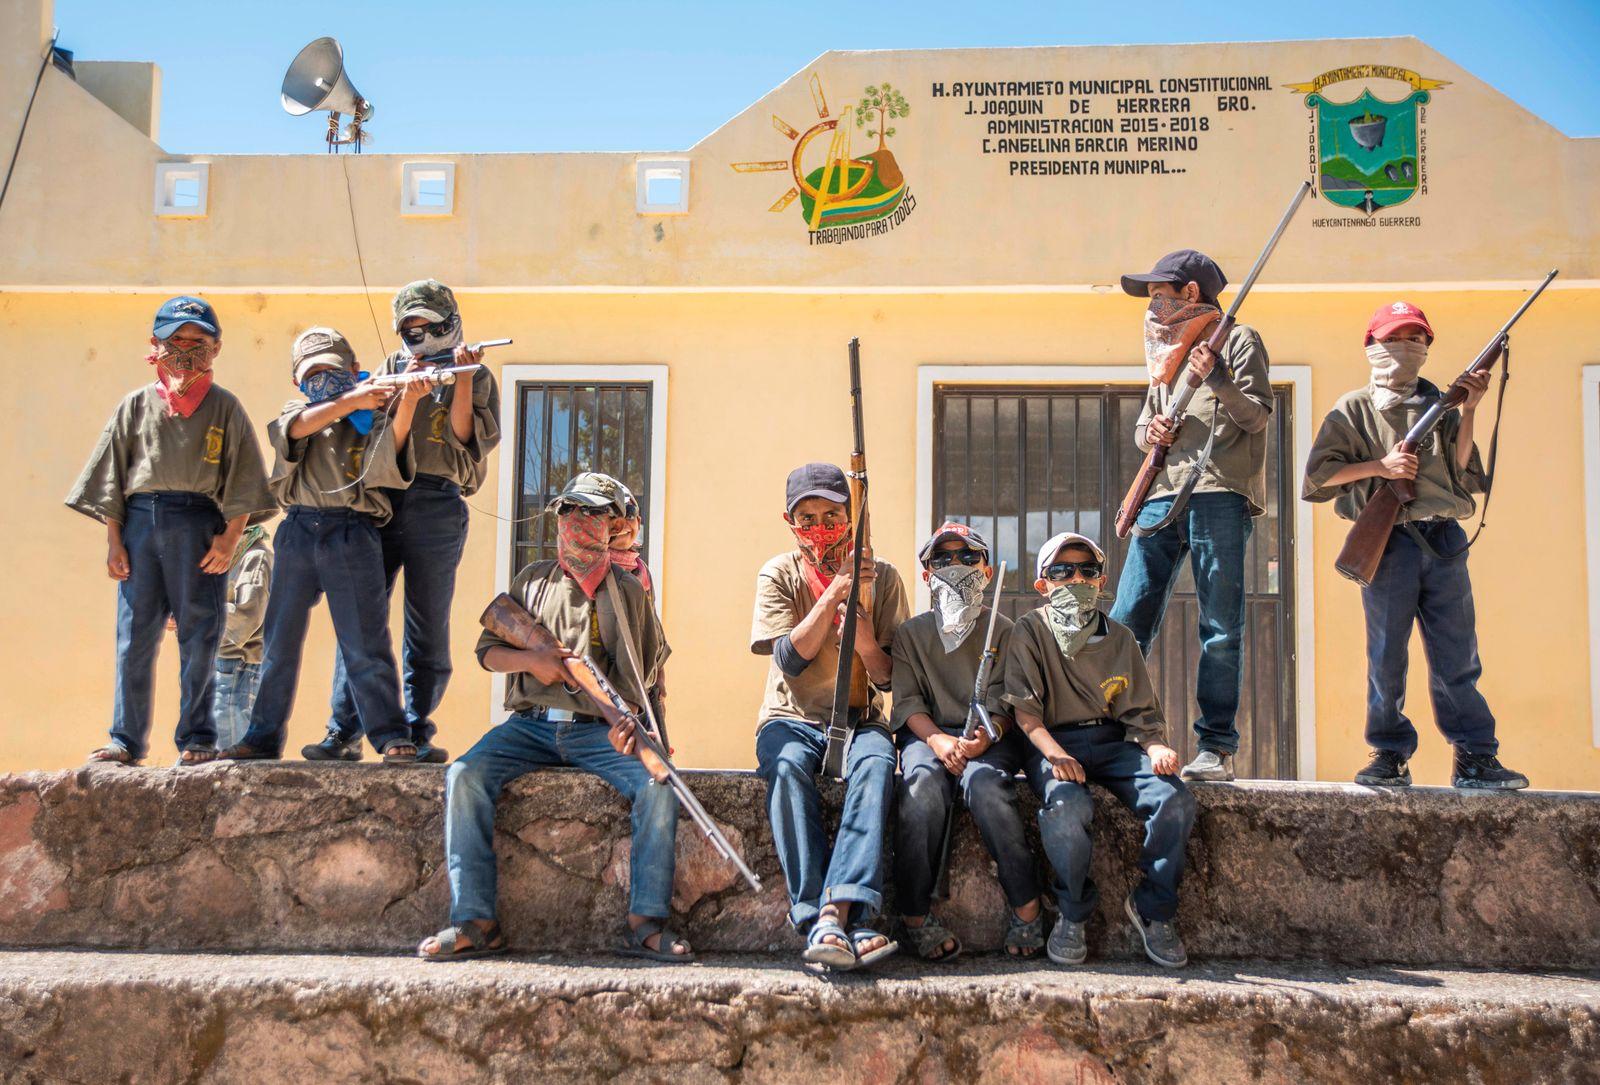 January 27, 2020, Guerrero, Mexico: Although Governor of Guerrero state: Hector Astudillo condemned